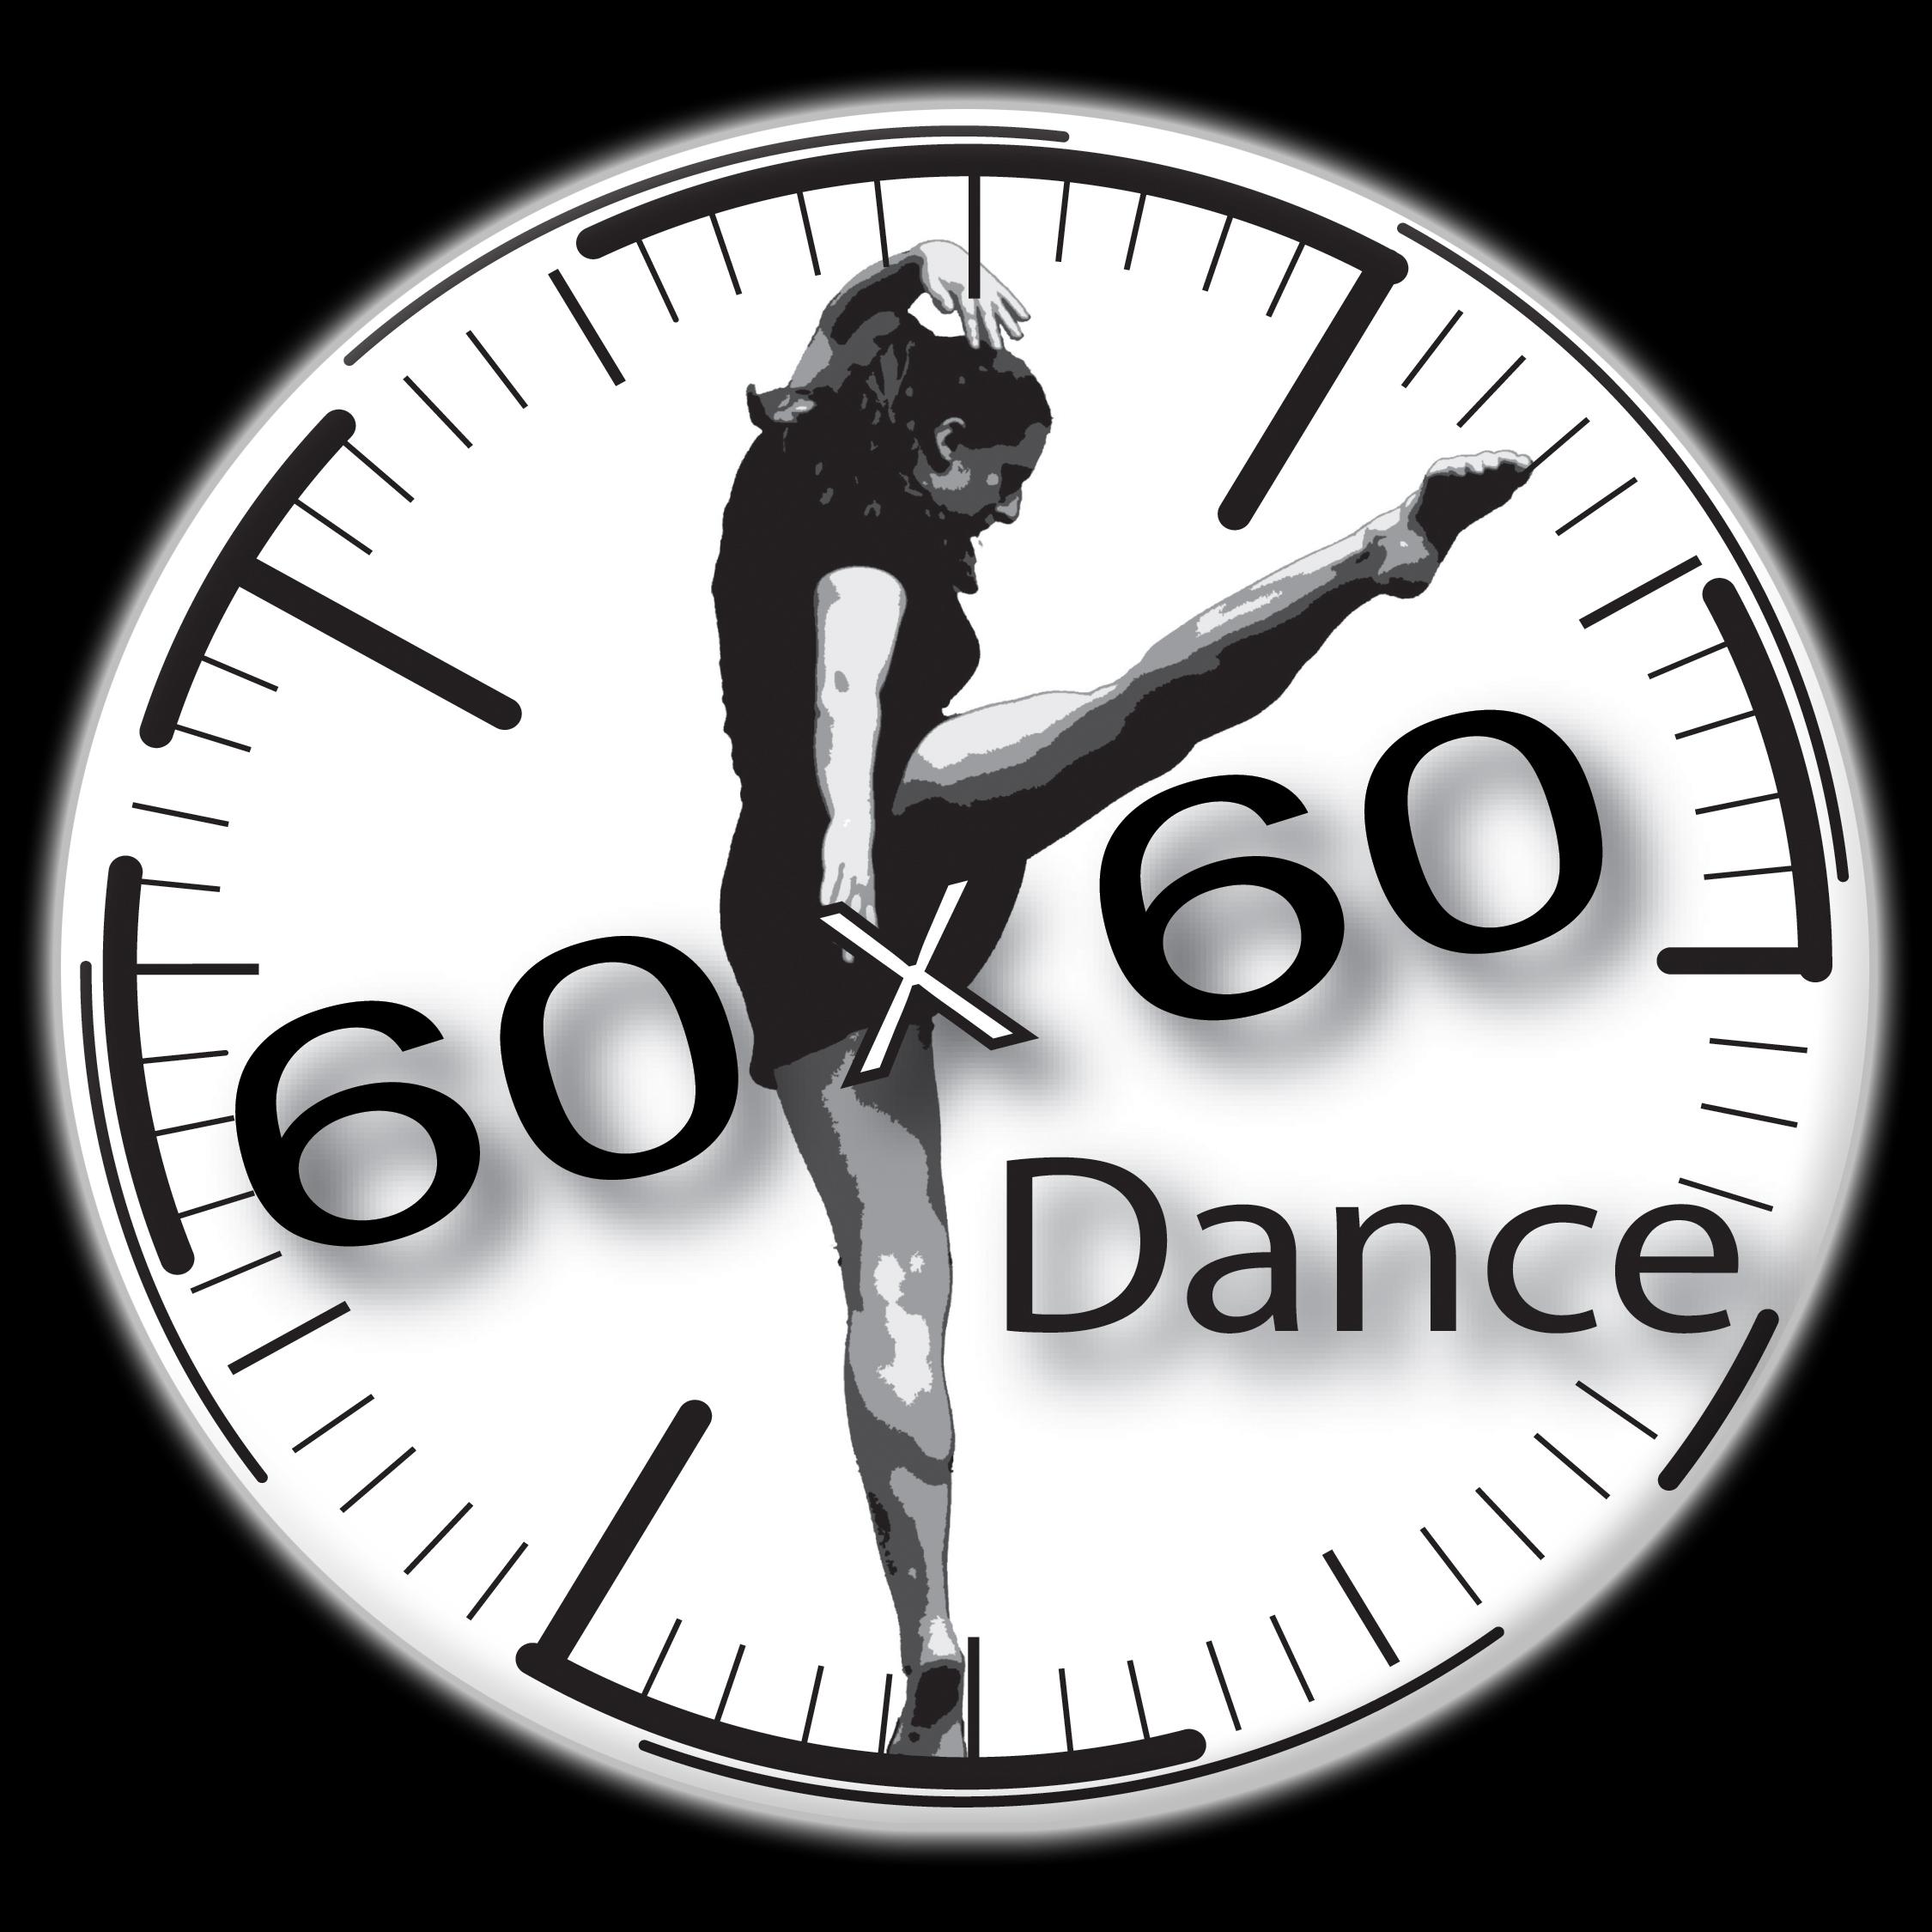 60x60 Dance